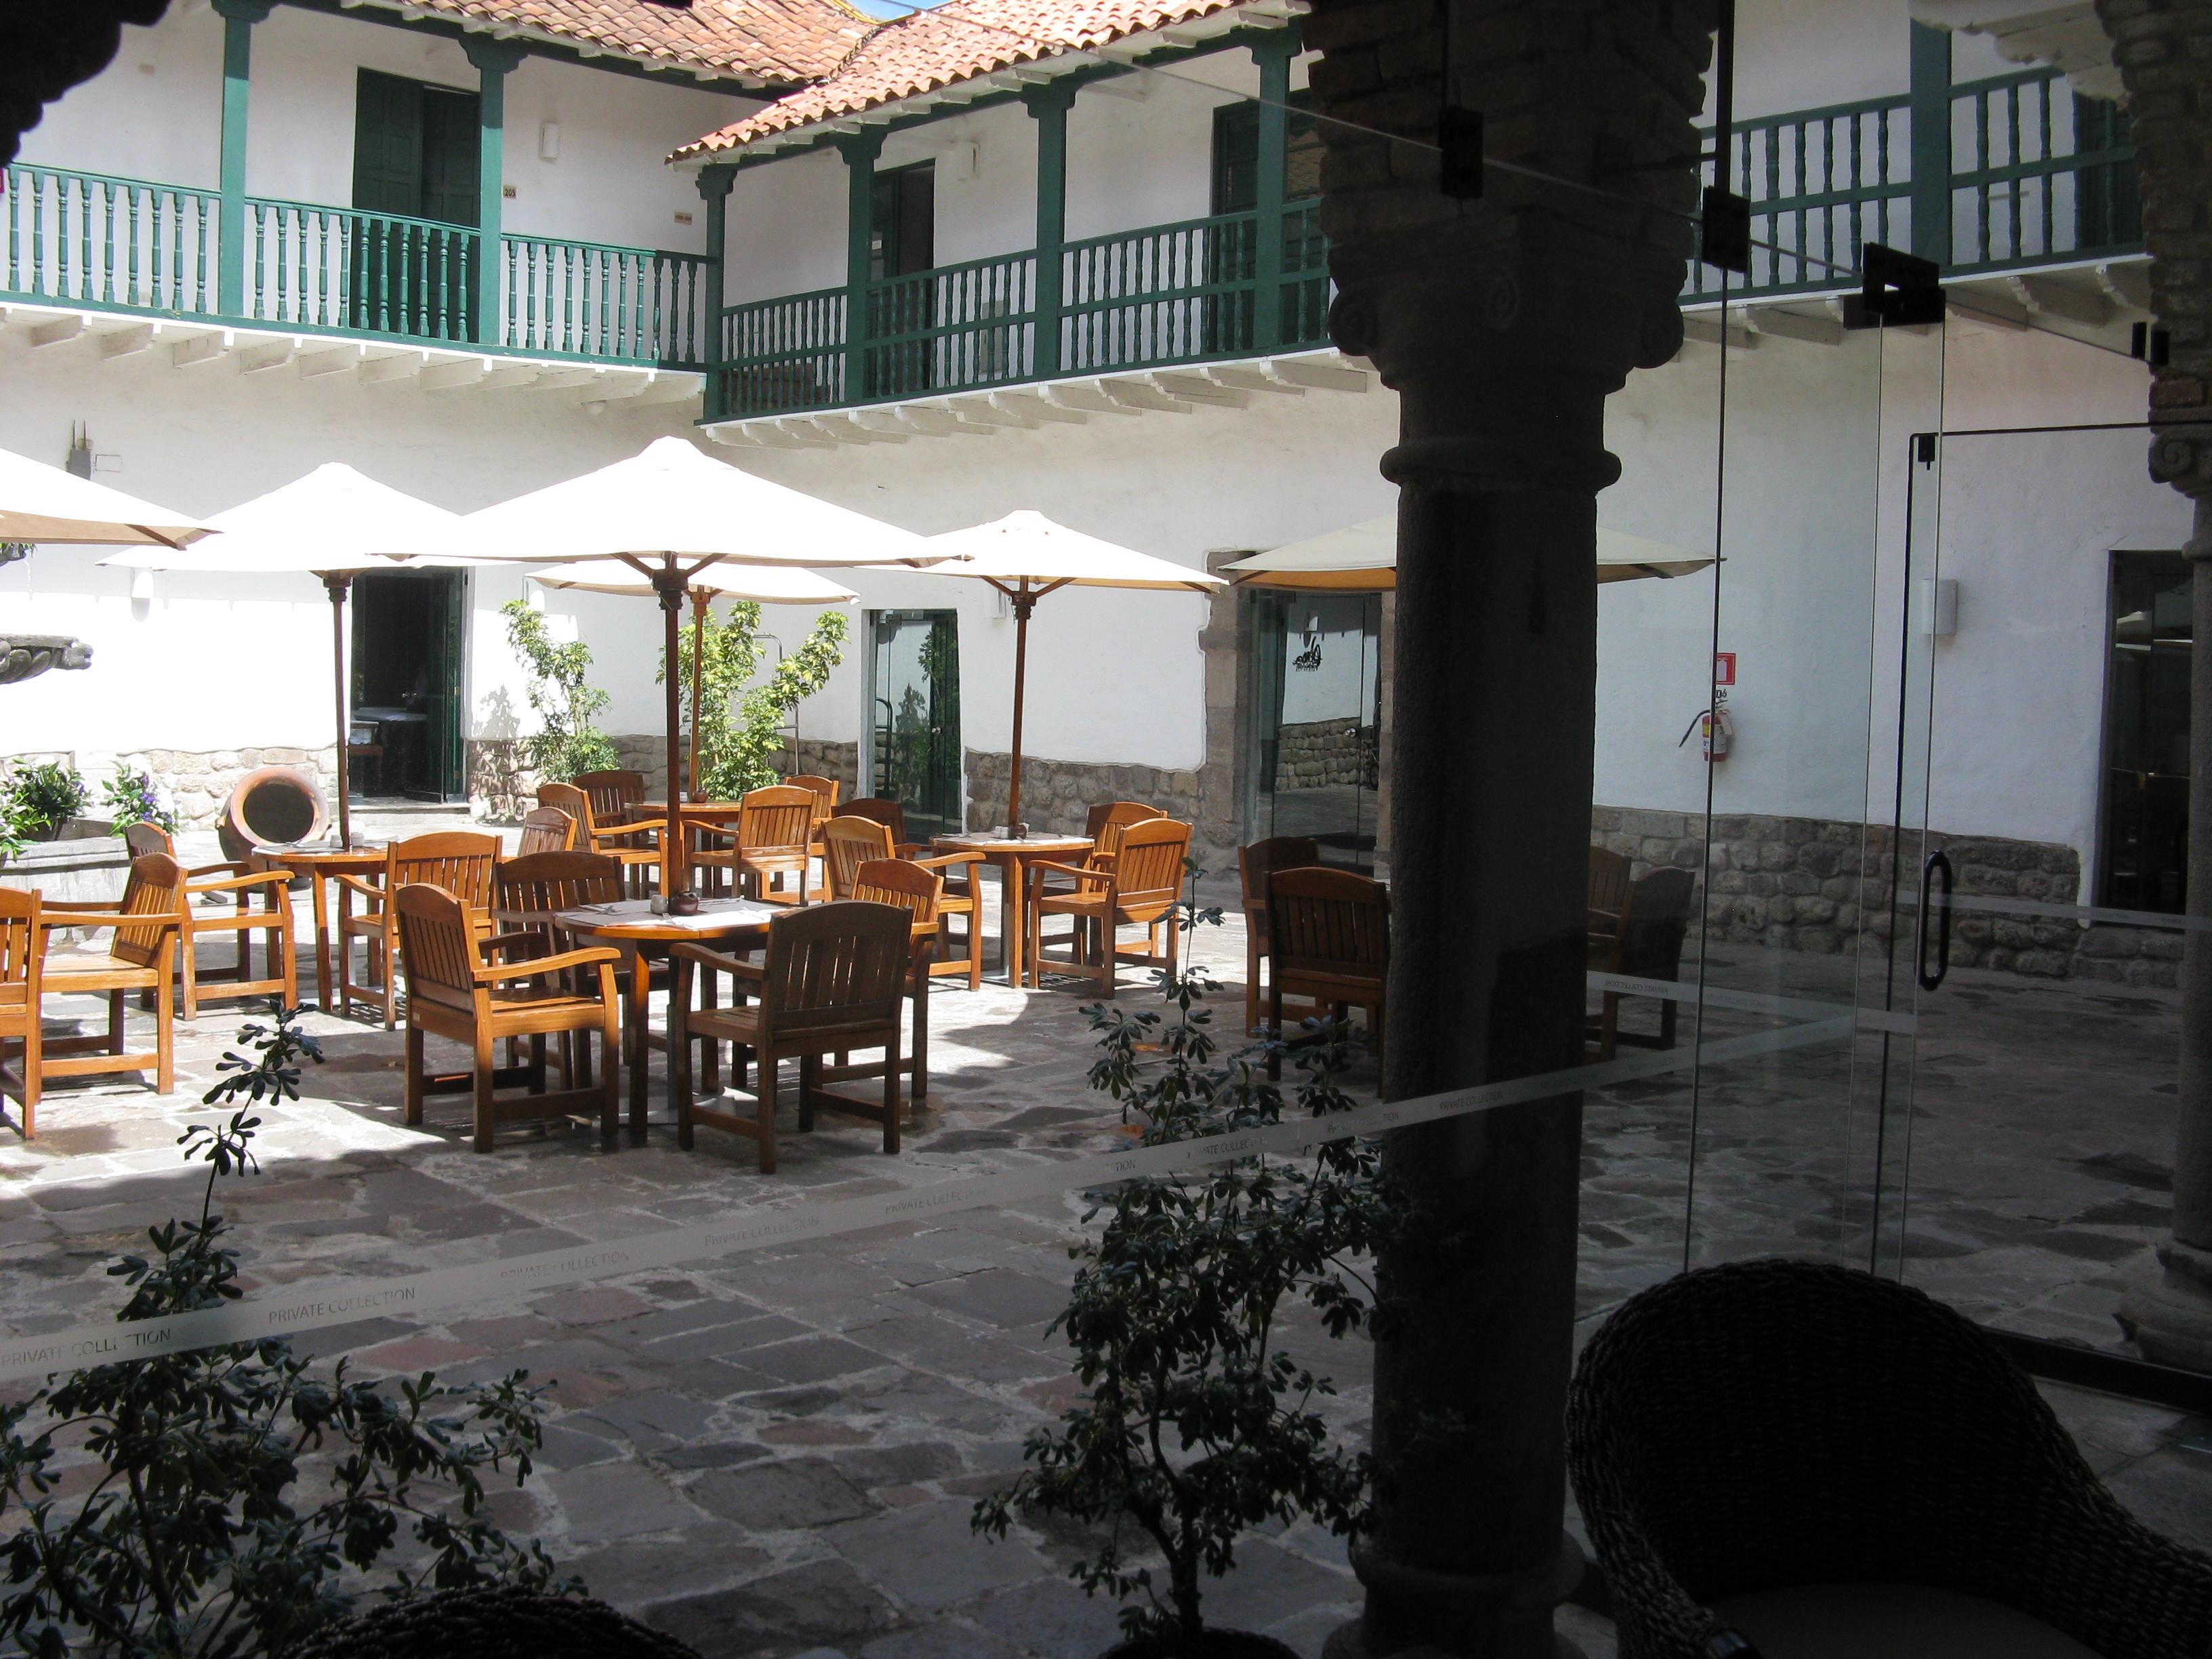 South america peru cusco the real chrisparkle for Casa andina private collection cusco